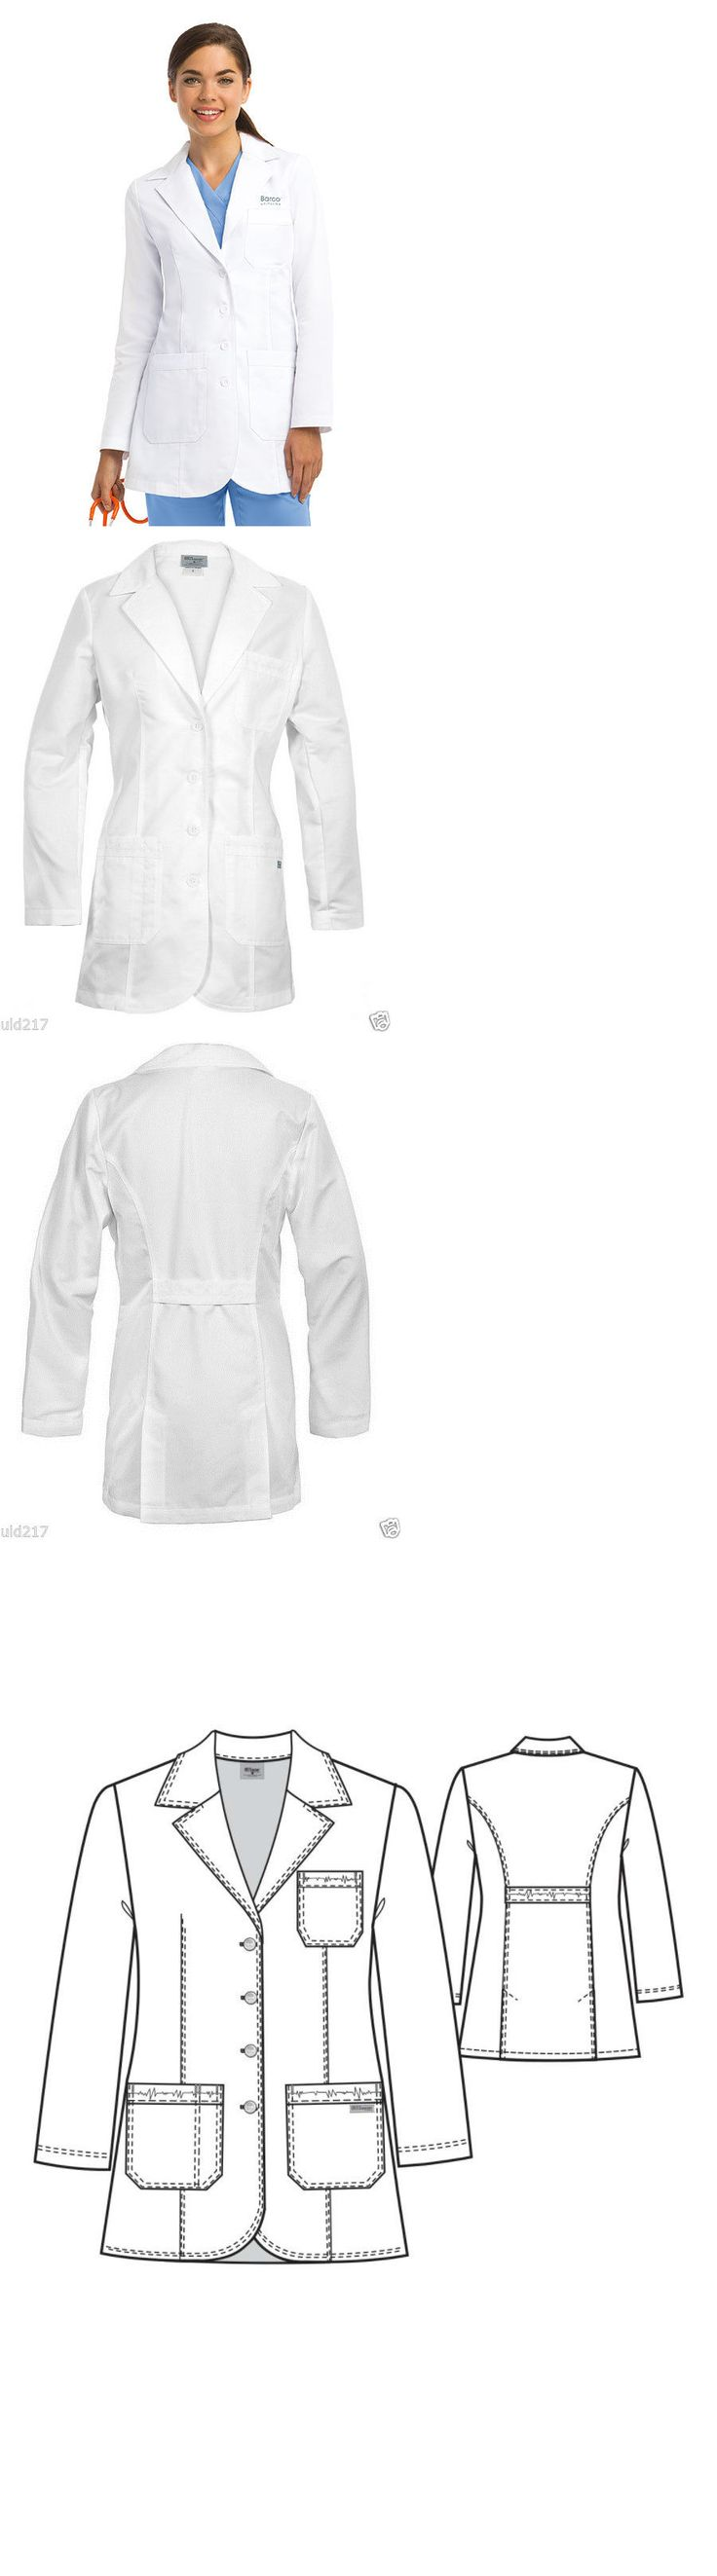 White lab apron - Lab Coats 105417 Grey S Anatomy Womens 32 Inch White Lab Coat 4425 Nwt